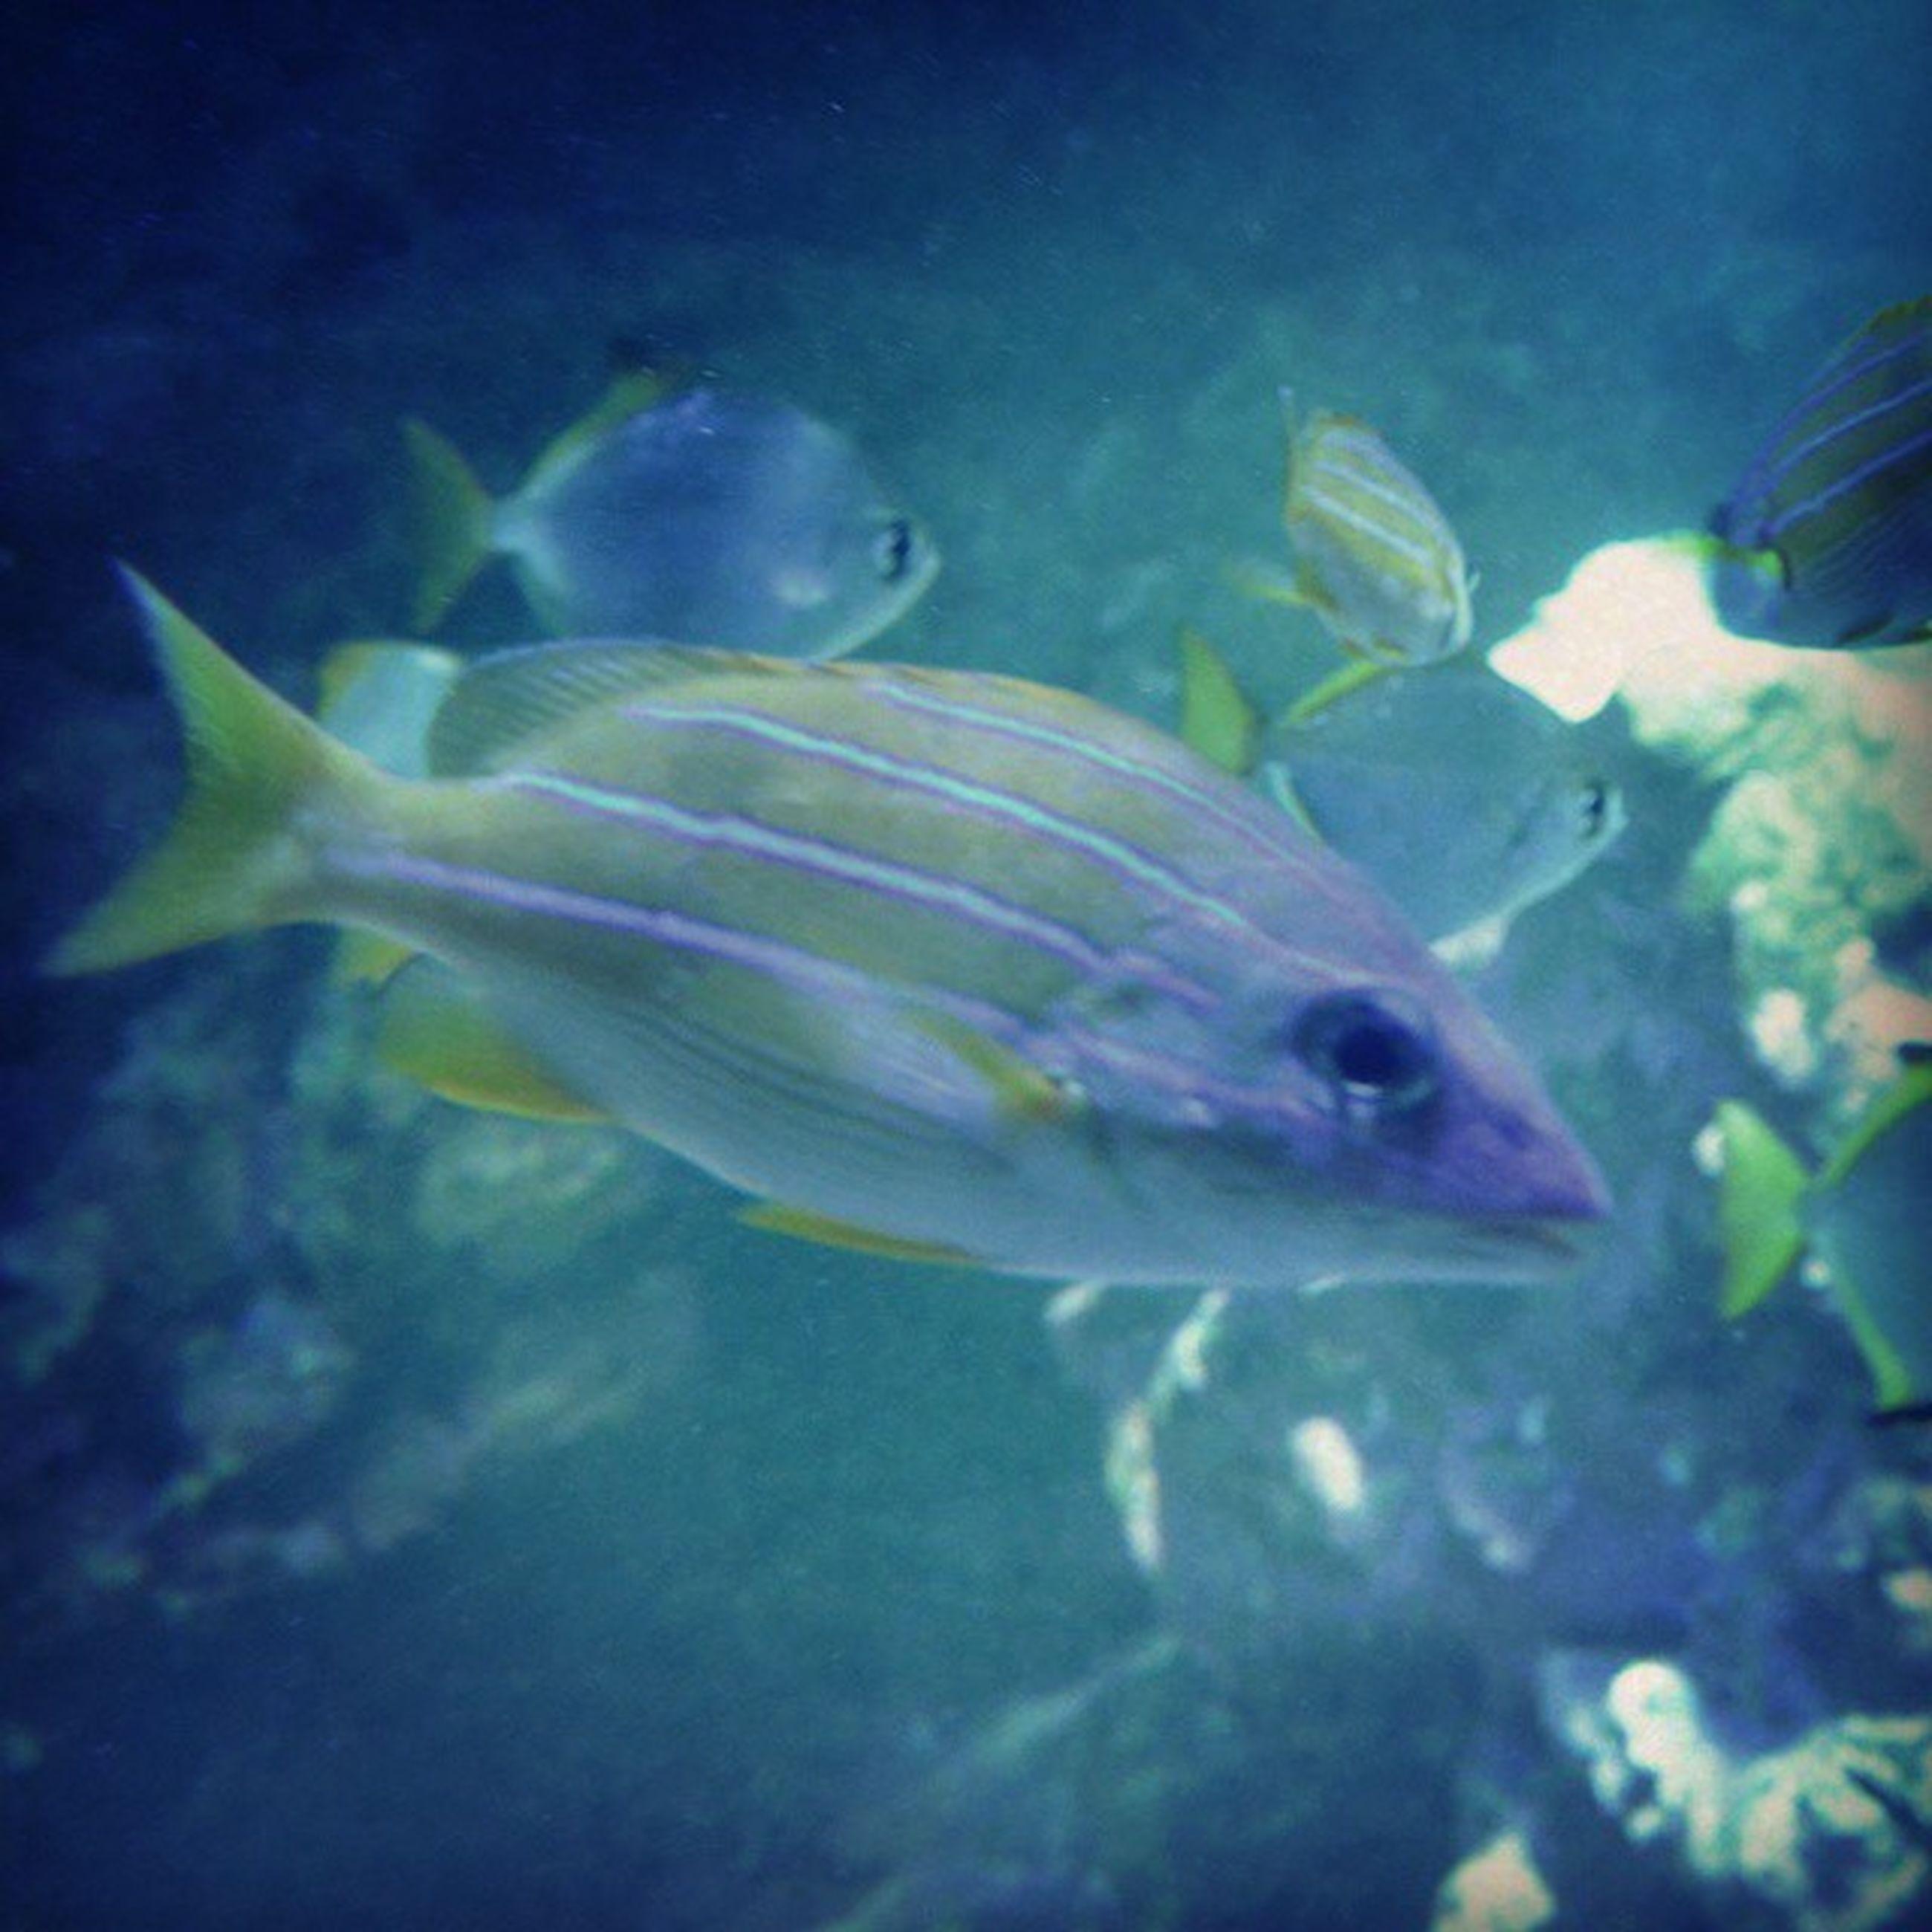 animal themes, underwater, animals in the wild, swimming, fish, wildlife, sea life, water, undersea, one animal, aquarium, sea, nature, close-up, beauty in nature, zoology, transparent, indoors, aquatic, fish tank